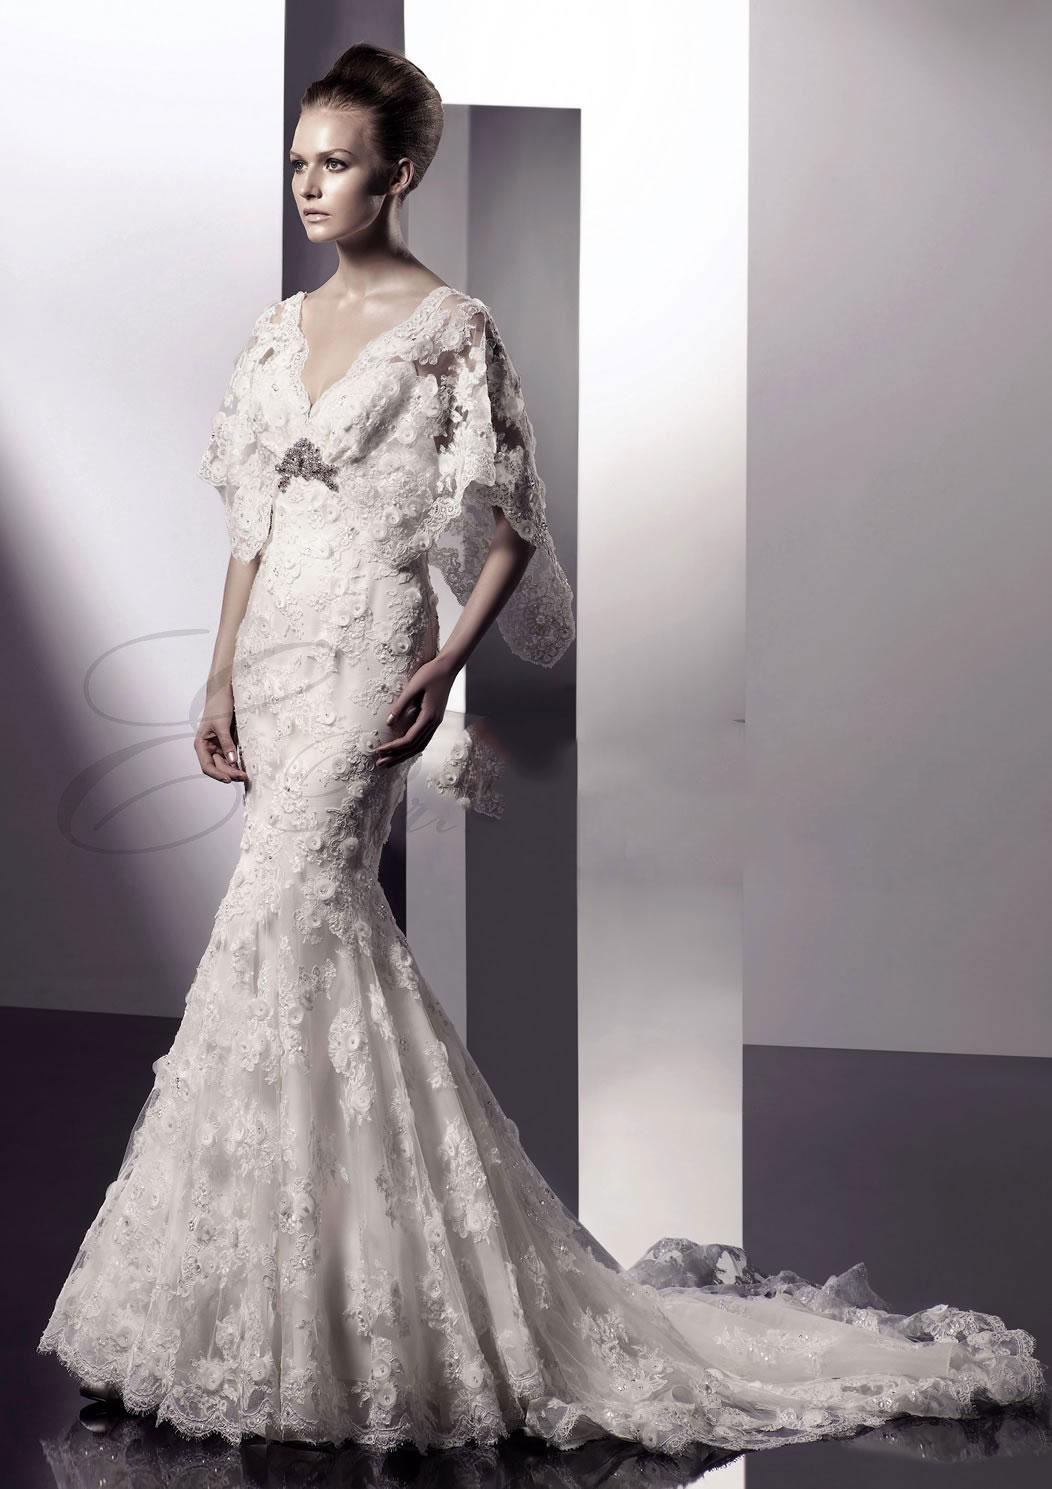 Amazing Mermaid Wedding Dresses 2013 (42)